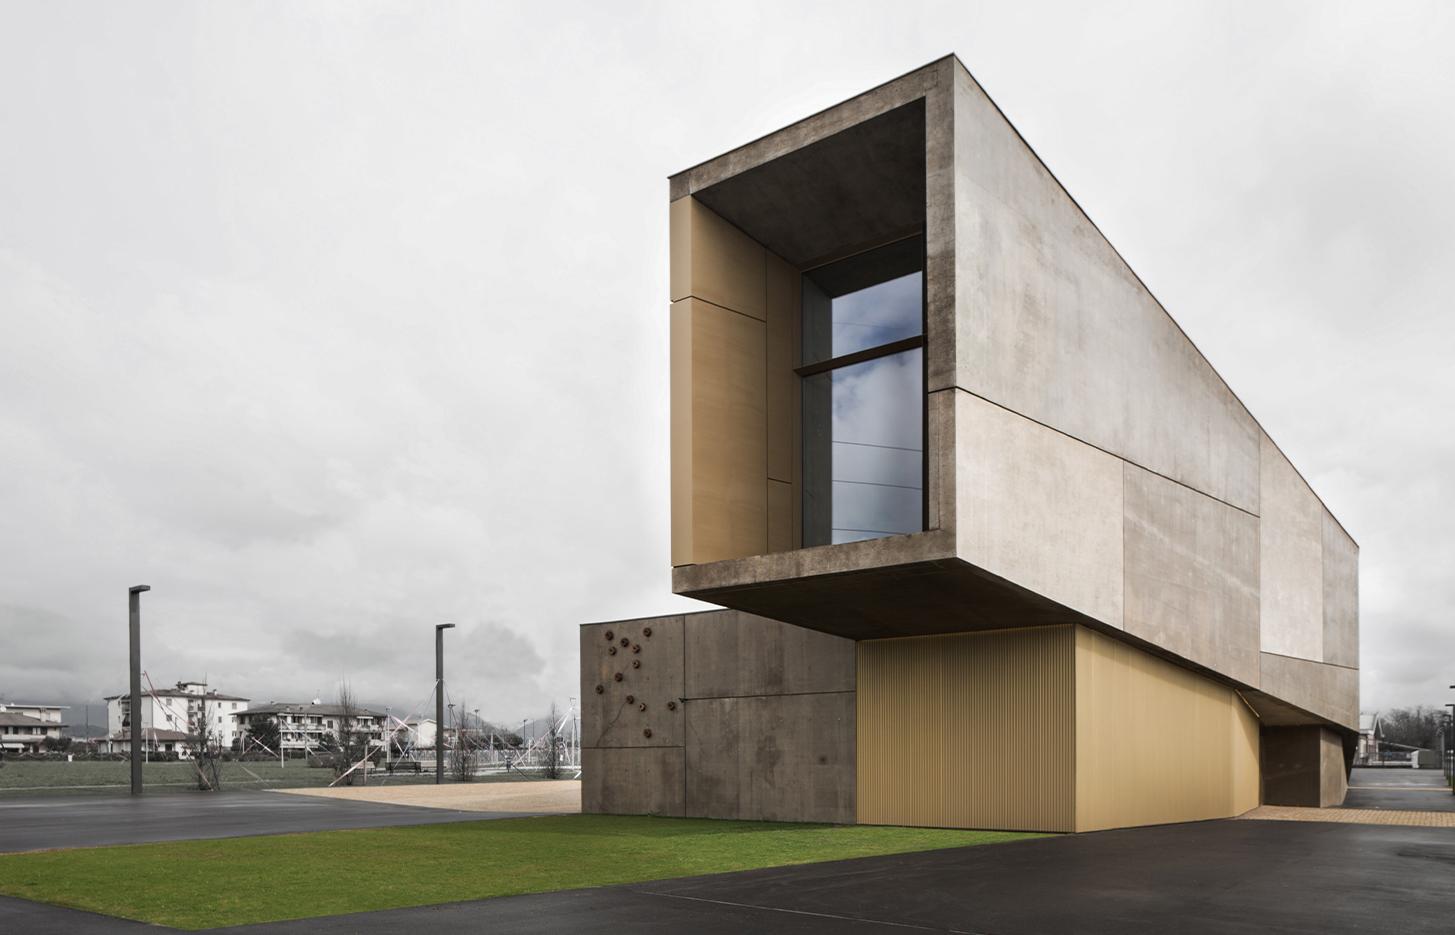 Paolo Belloni | New Church and Parish Center